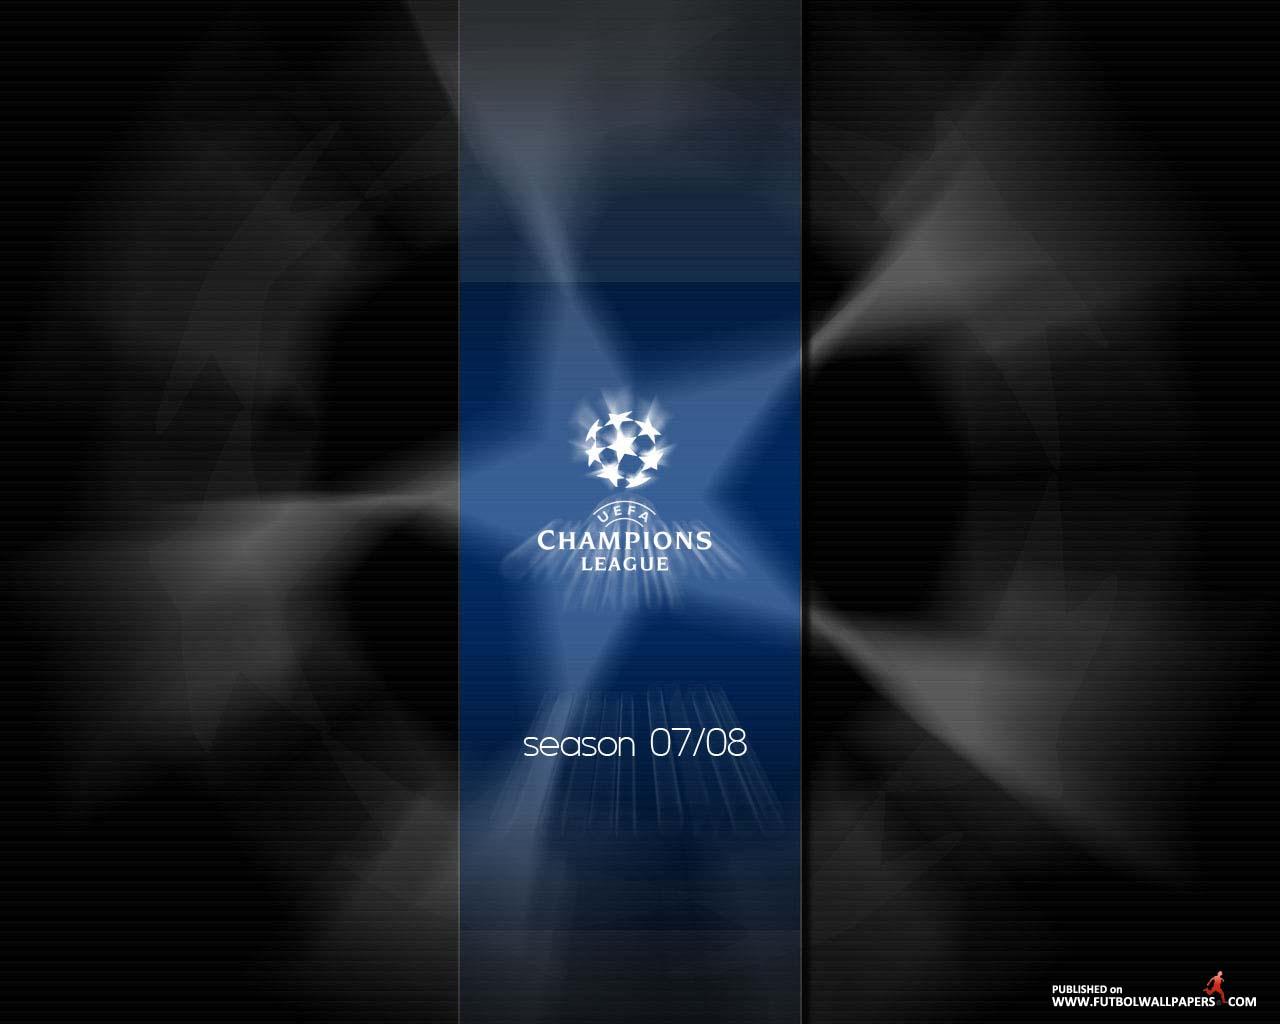 photograf uefa champions league wallpaper 1280x1024